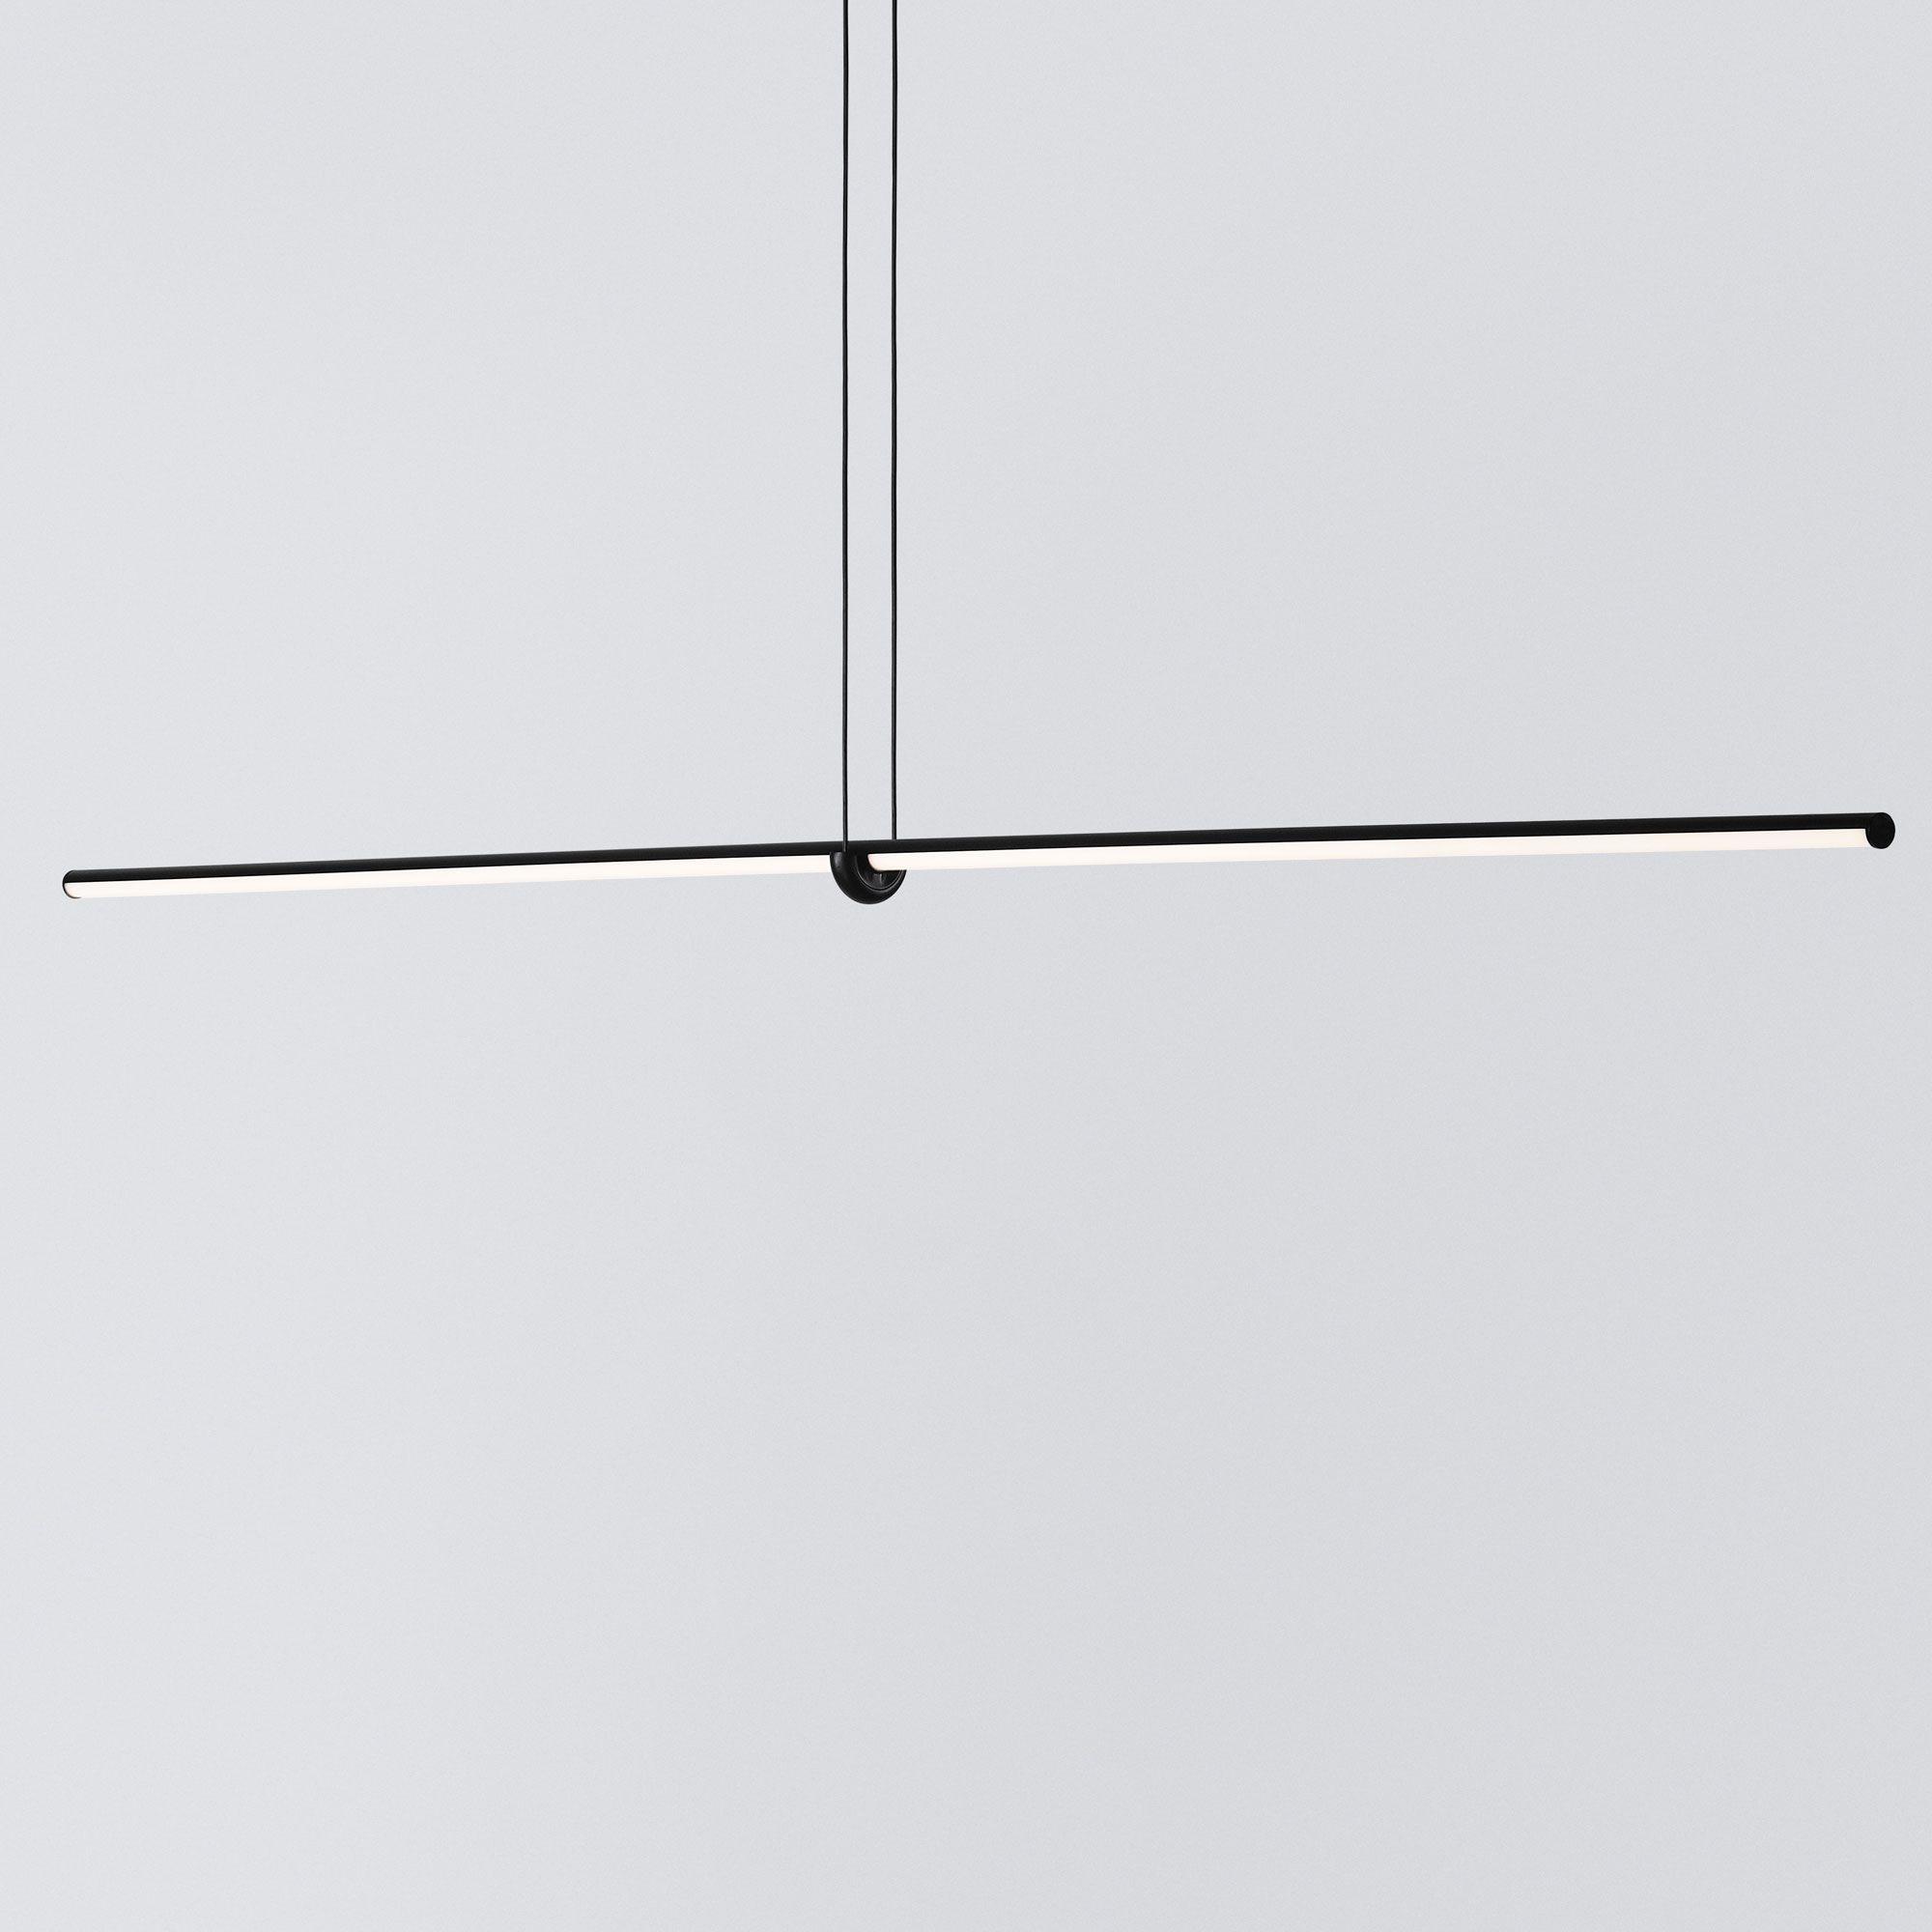 Arrangements Line Suspension By Flos Lighting Lc Arrnge Line In 2020 Geometric Lighting Linear Pendant Lighting Flos